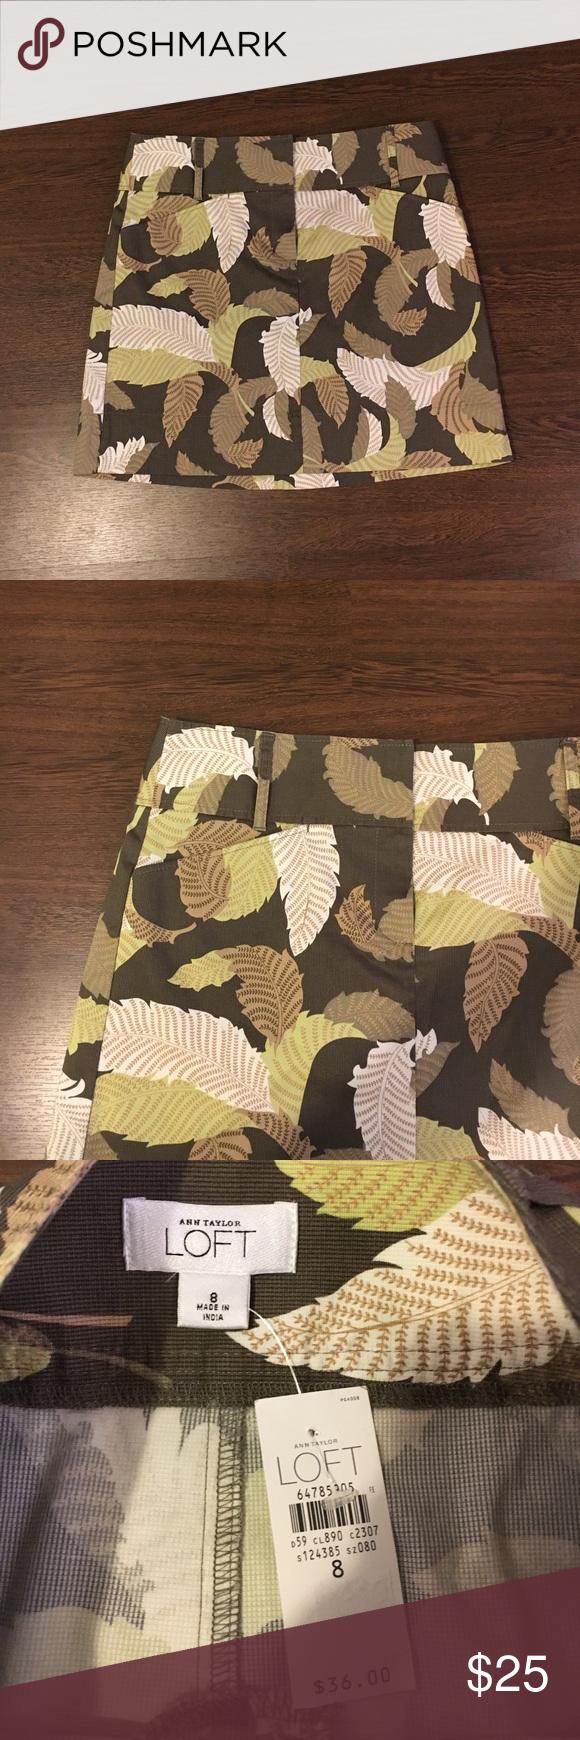 Ann Taylor LOFT Skirt size 8 Ann Taylor LOFT Print Skirt. Size 8. Brand new with tags. Ann Taylor Skirts